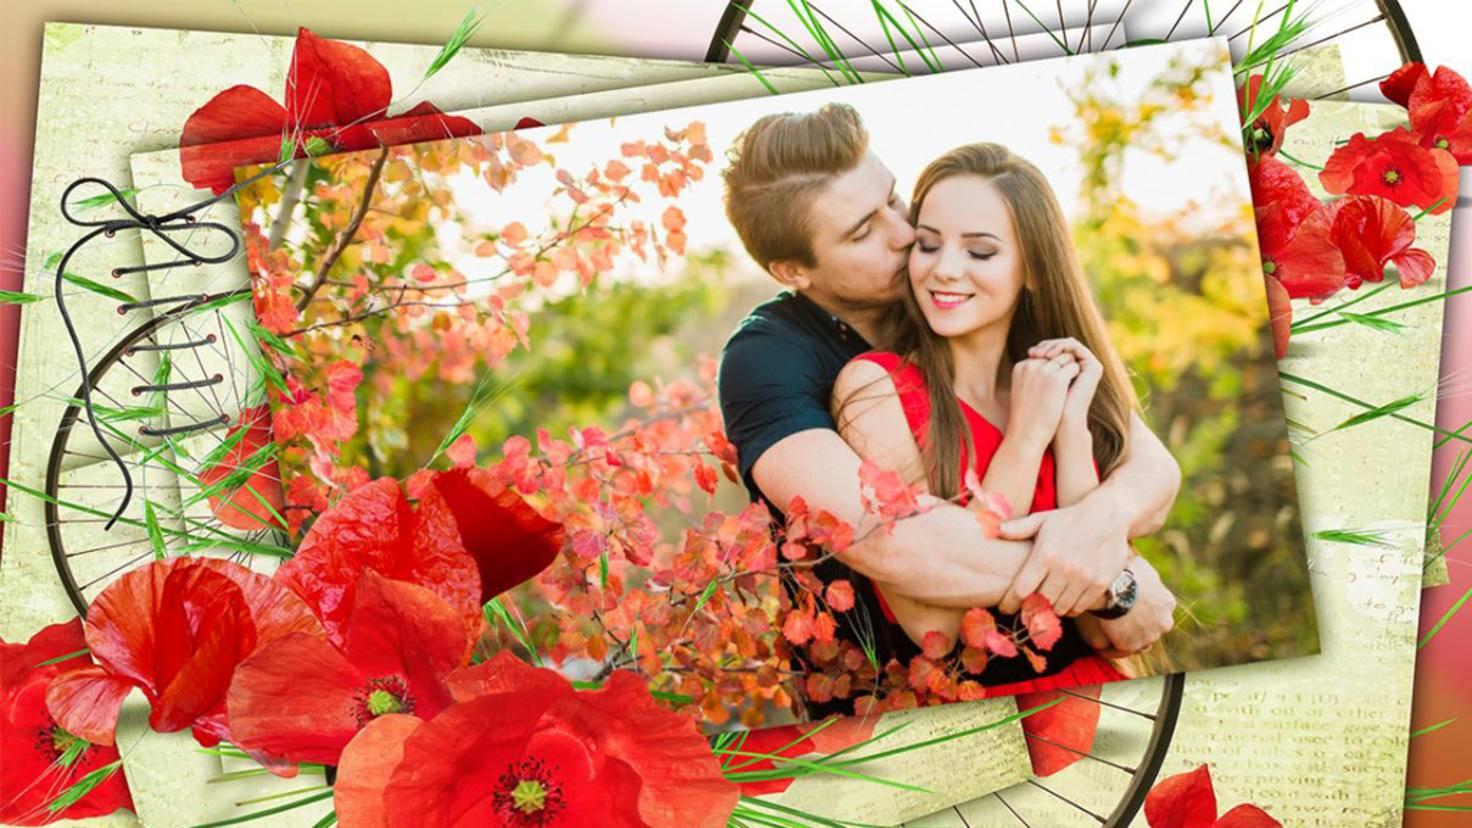 Valentines-Day-Photo-Frames-app